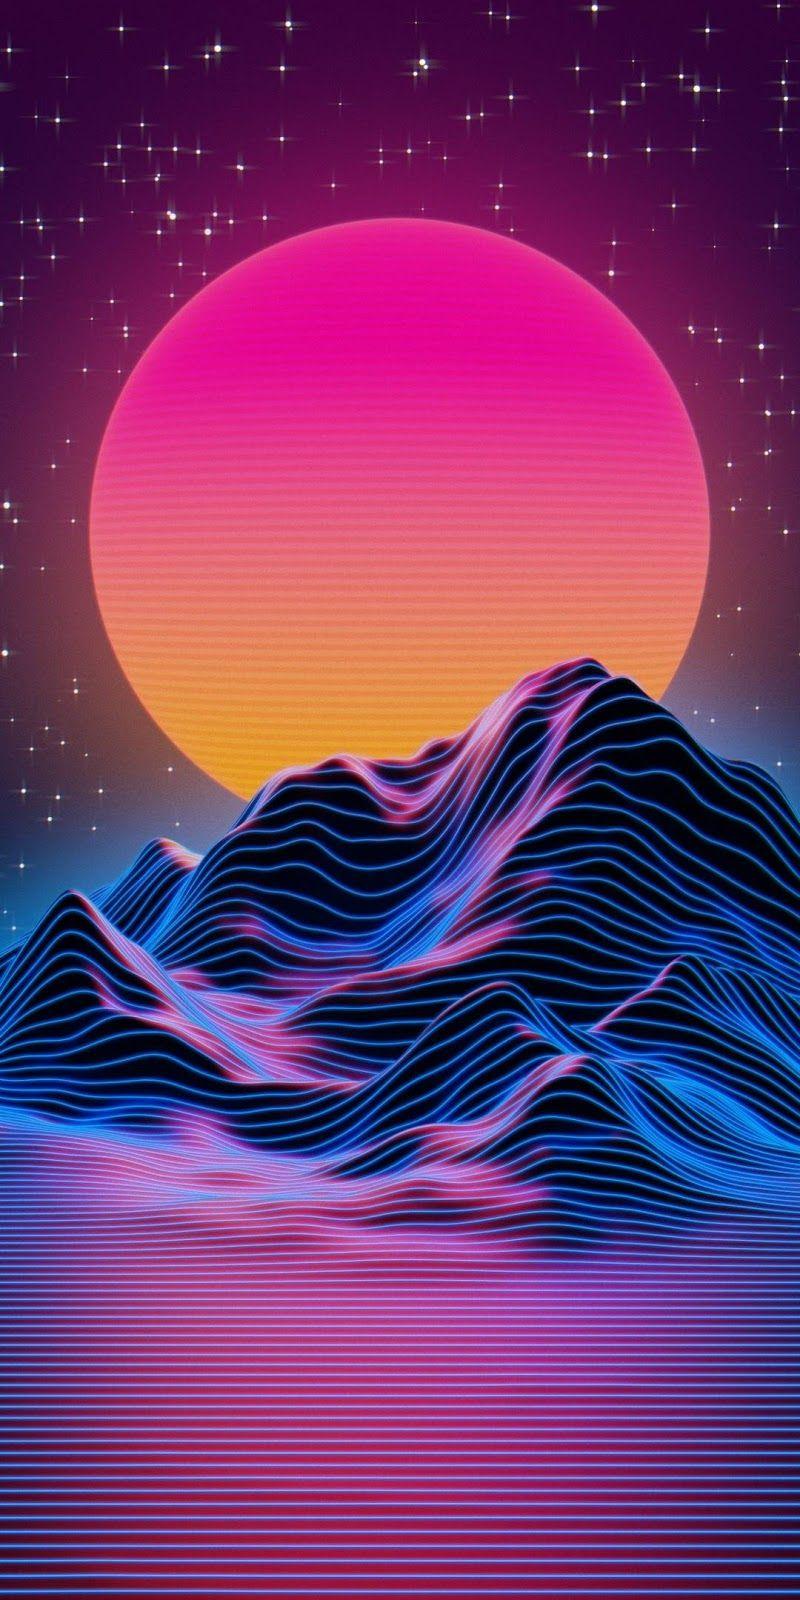 Vaporwave Sunset In 2020 Vaporwave Wallpaper Synthwave Art Phone Wallpaper